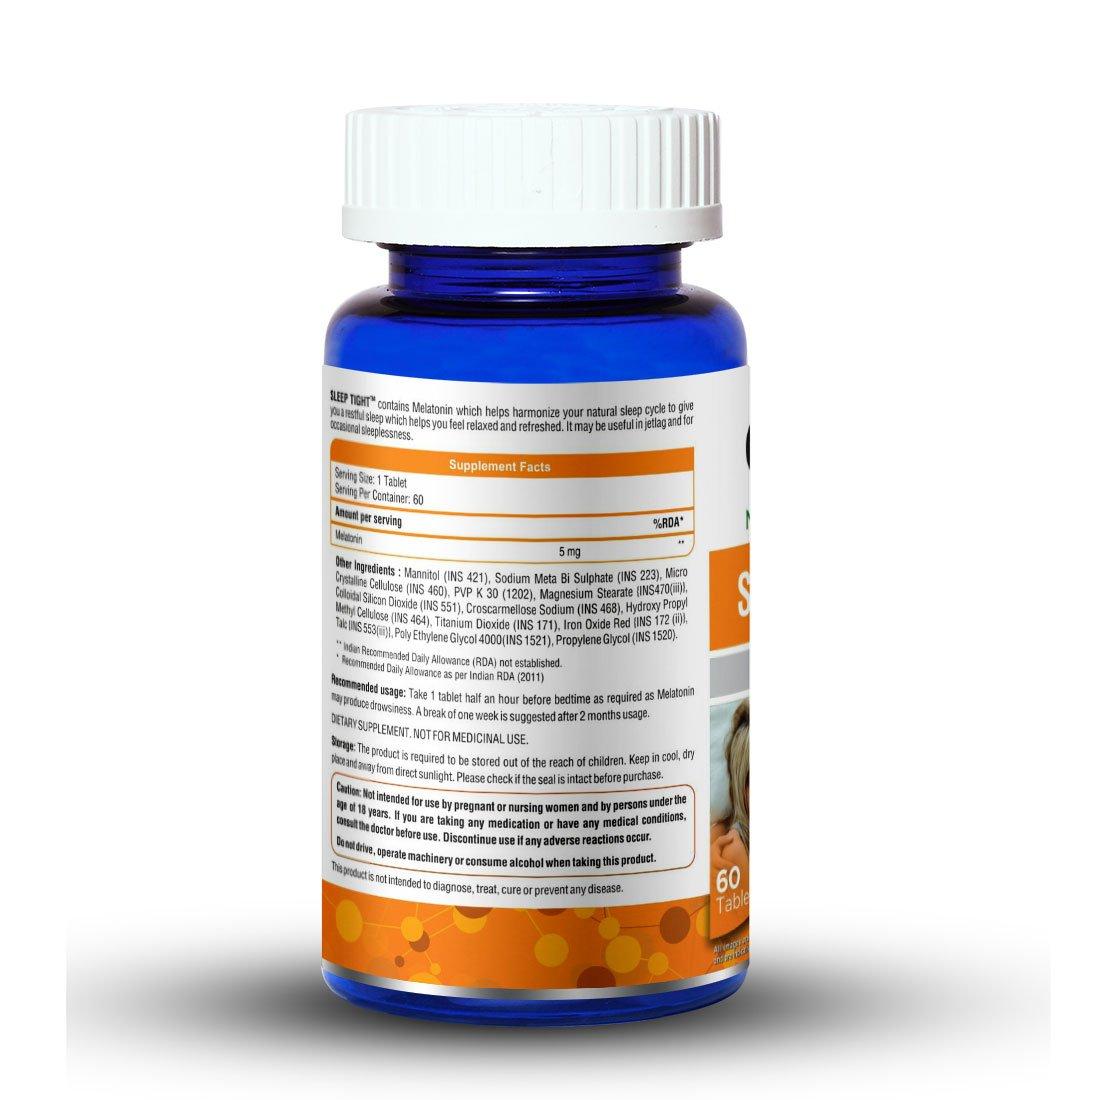 Amazon.com: Onelife Sleep Tight 5Mg : Melatonin - 5 Mg, 60 Tablets: Health & Personal Care